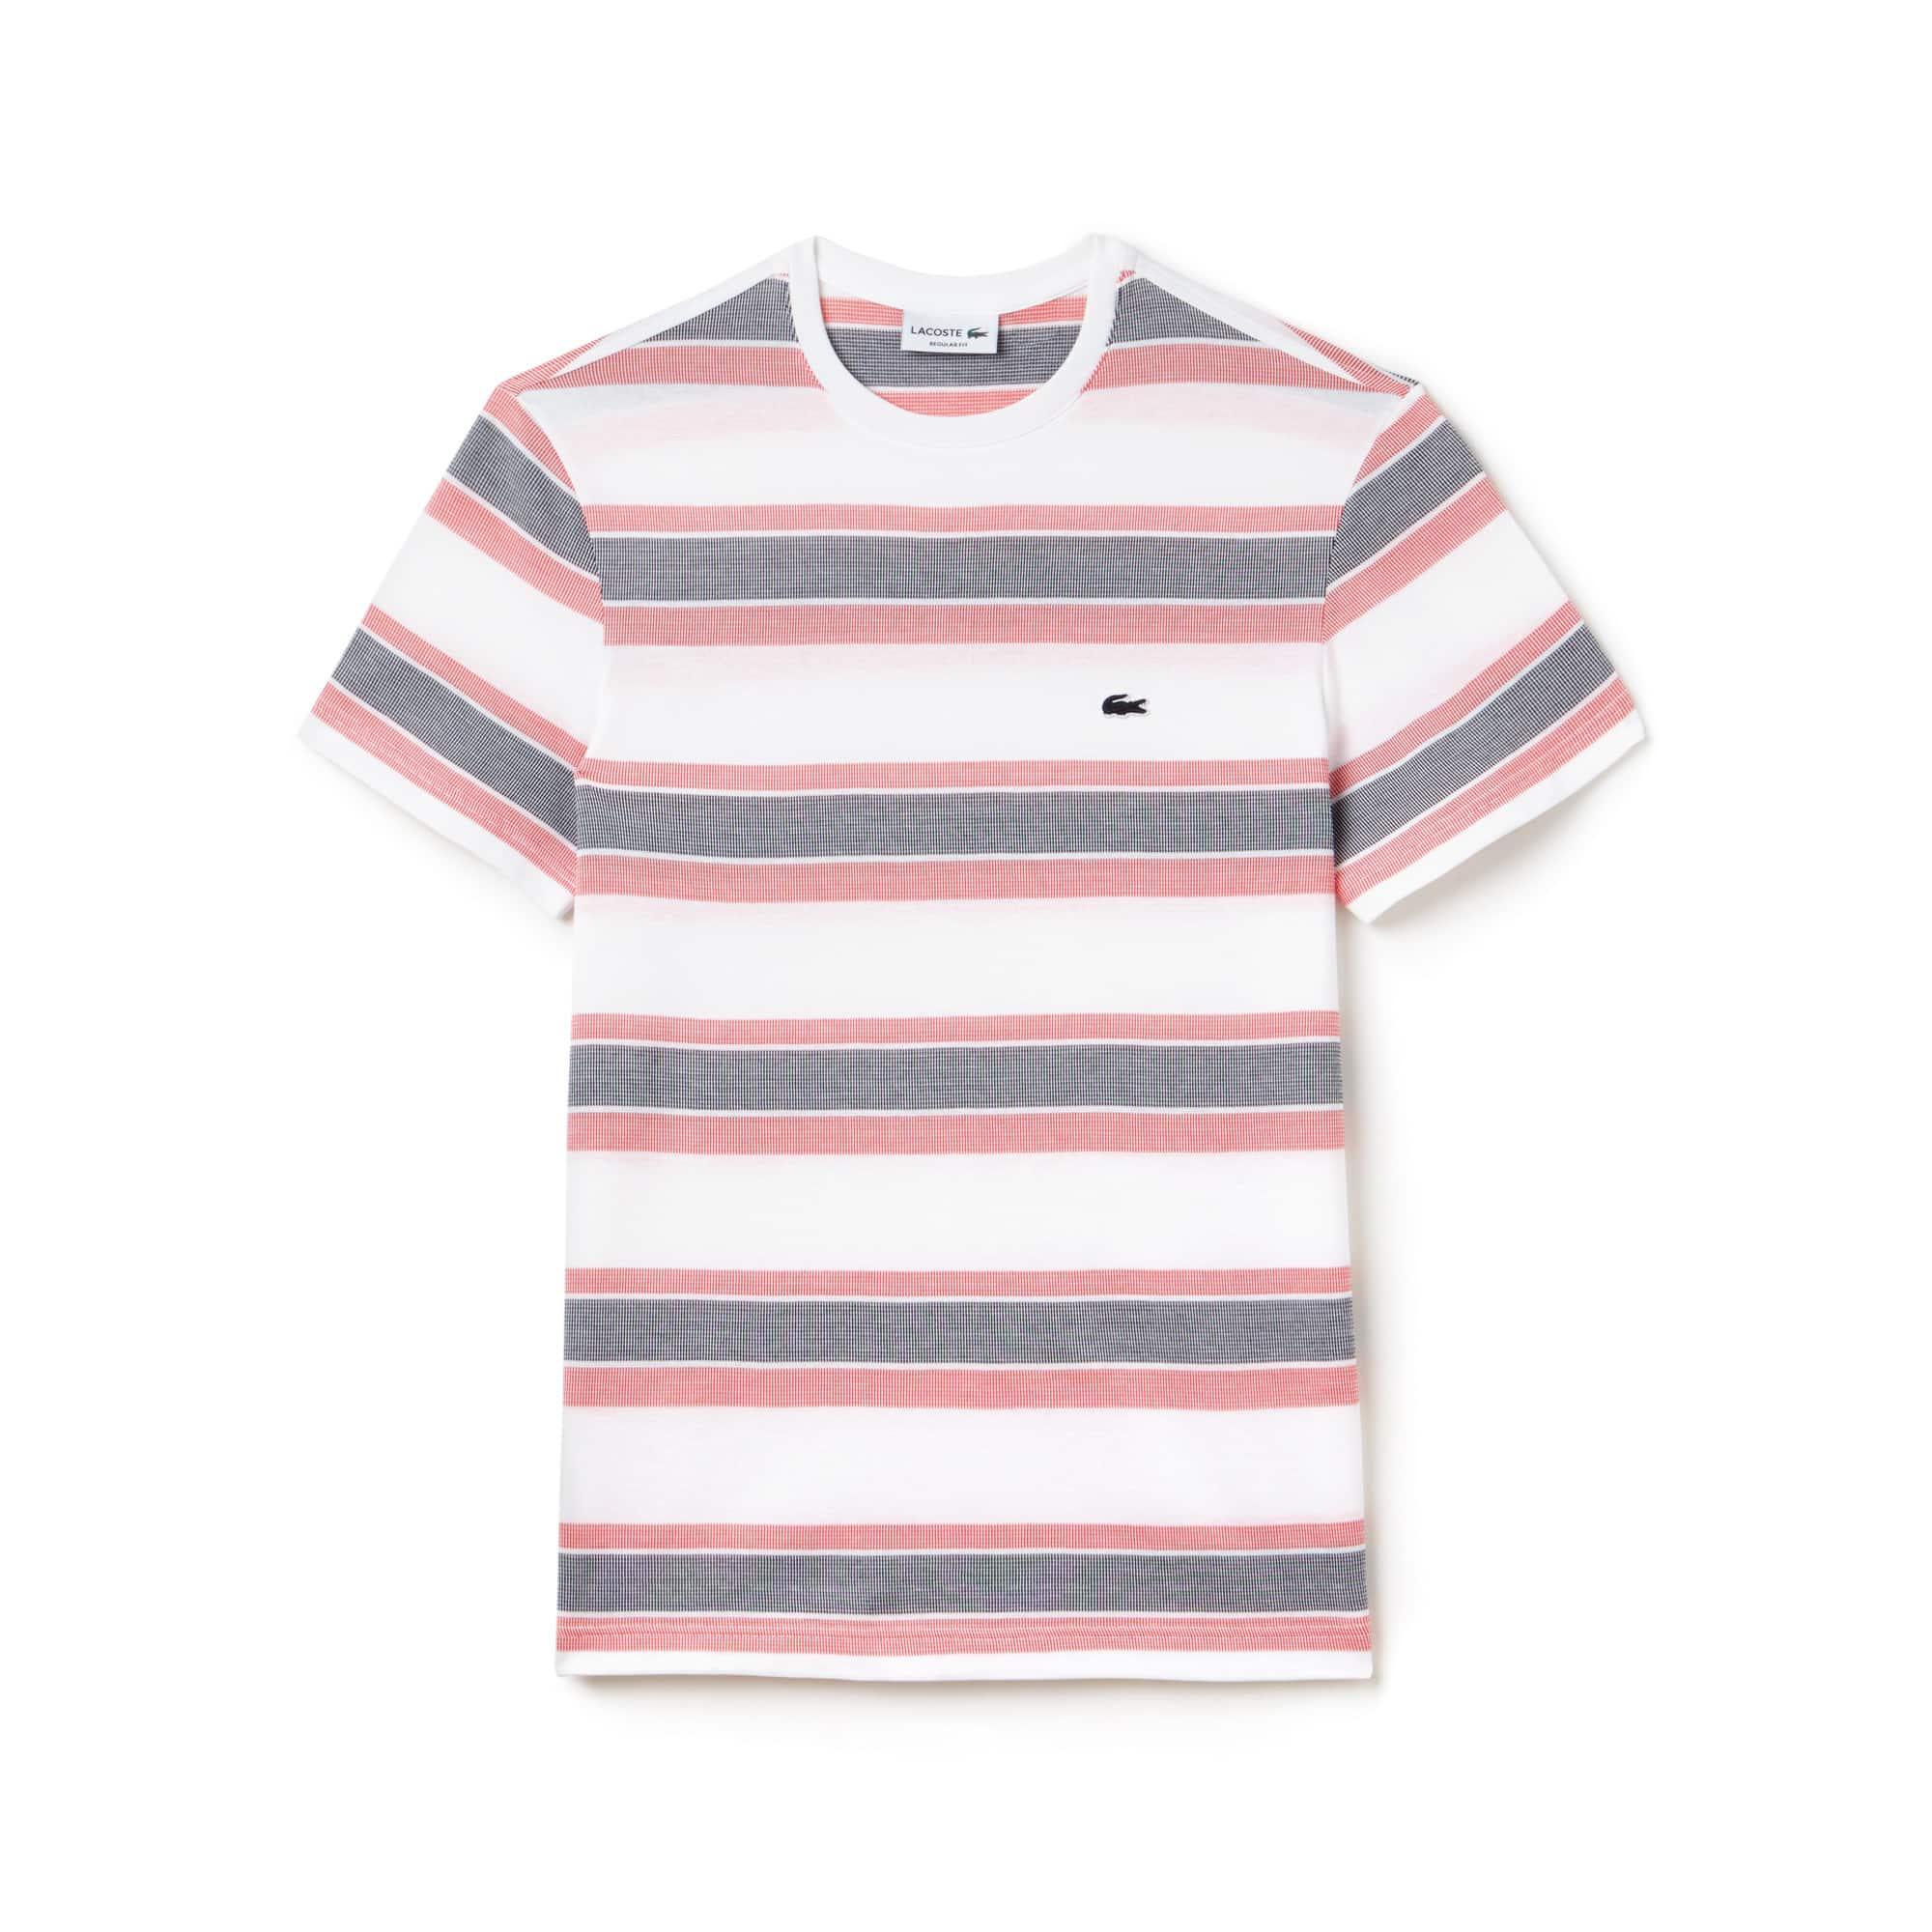 Men's Crew Neck Striped Jacquard Jersey T-Shirt